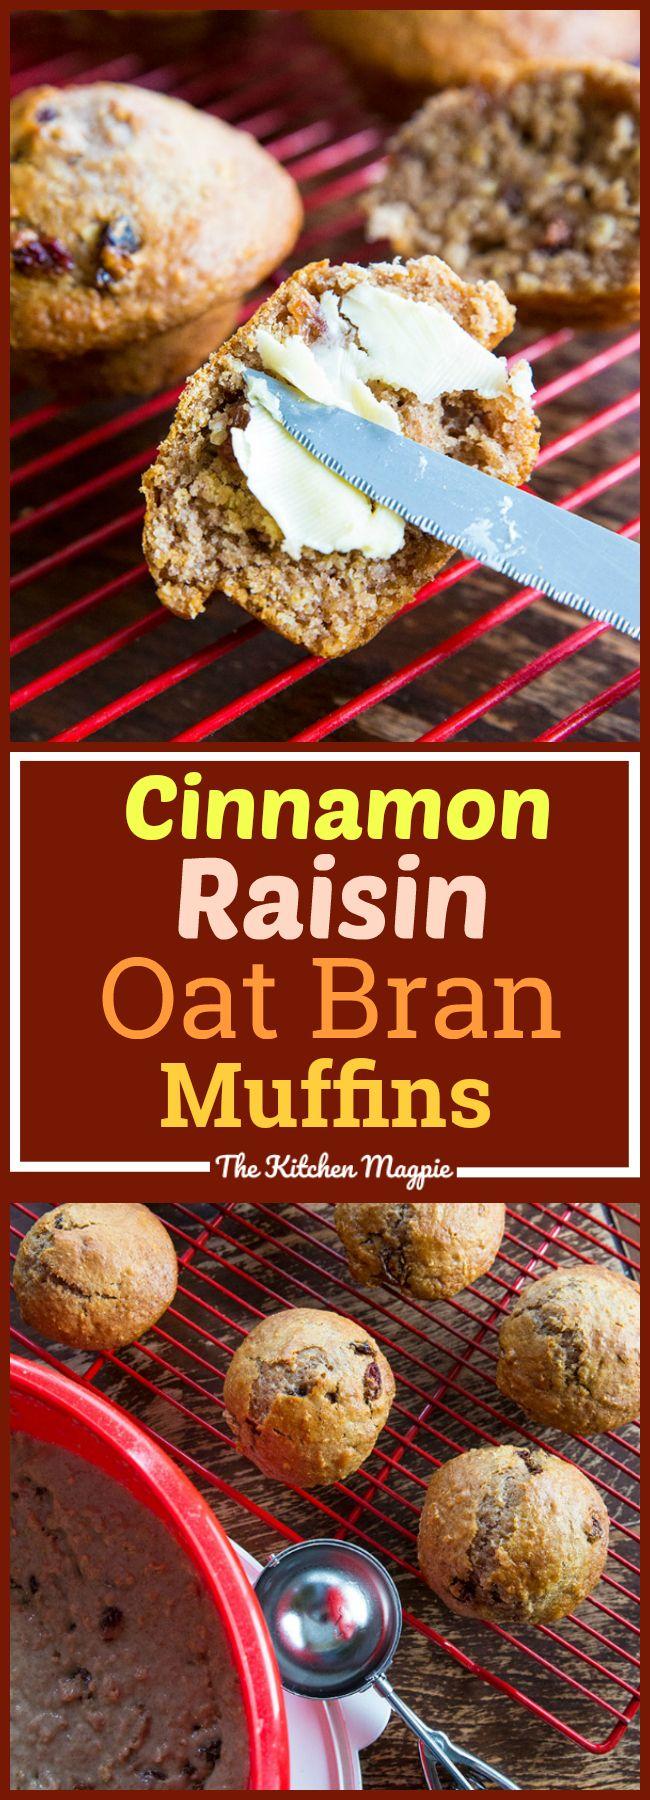 Cinnamon Raisin Oat Bran 6 Week Refrigerator Muffins, the perfect delicious twist to the classic refrigerator muffin!